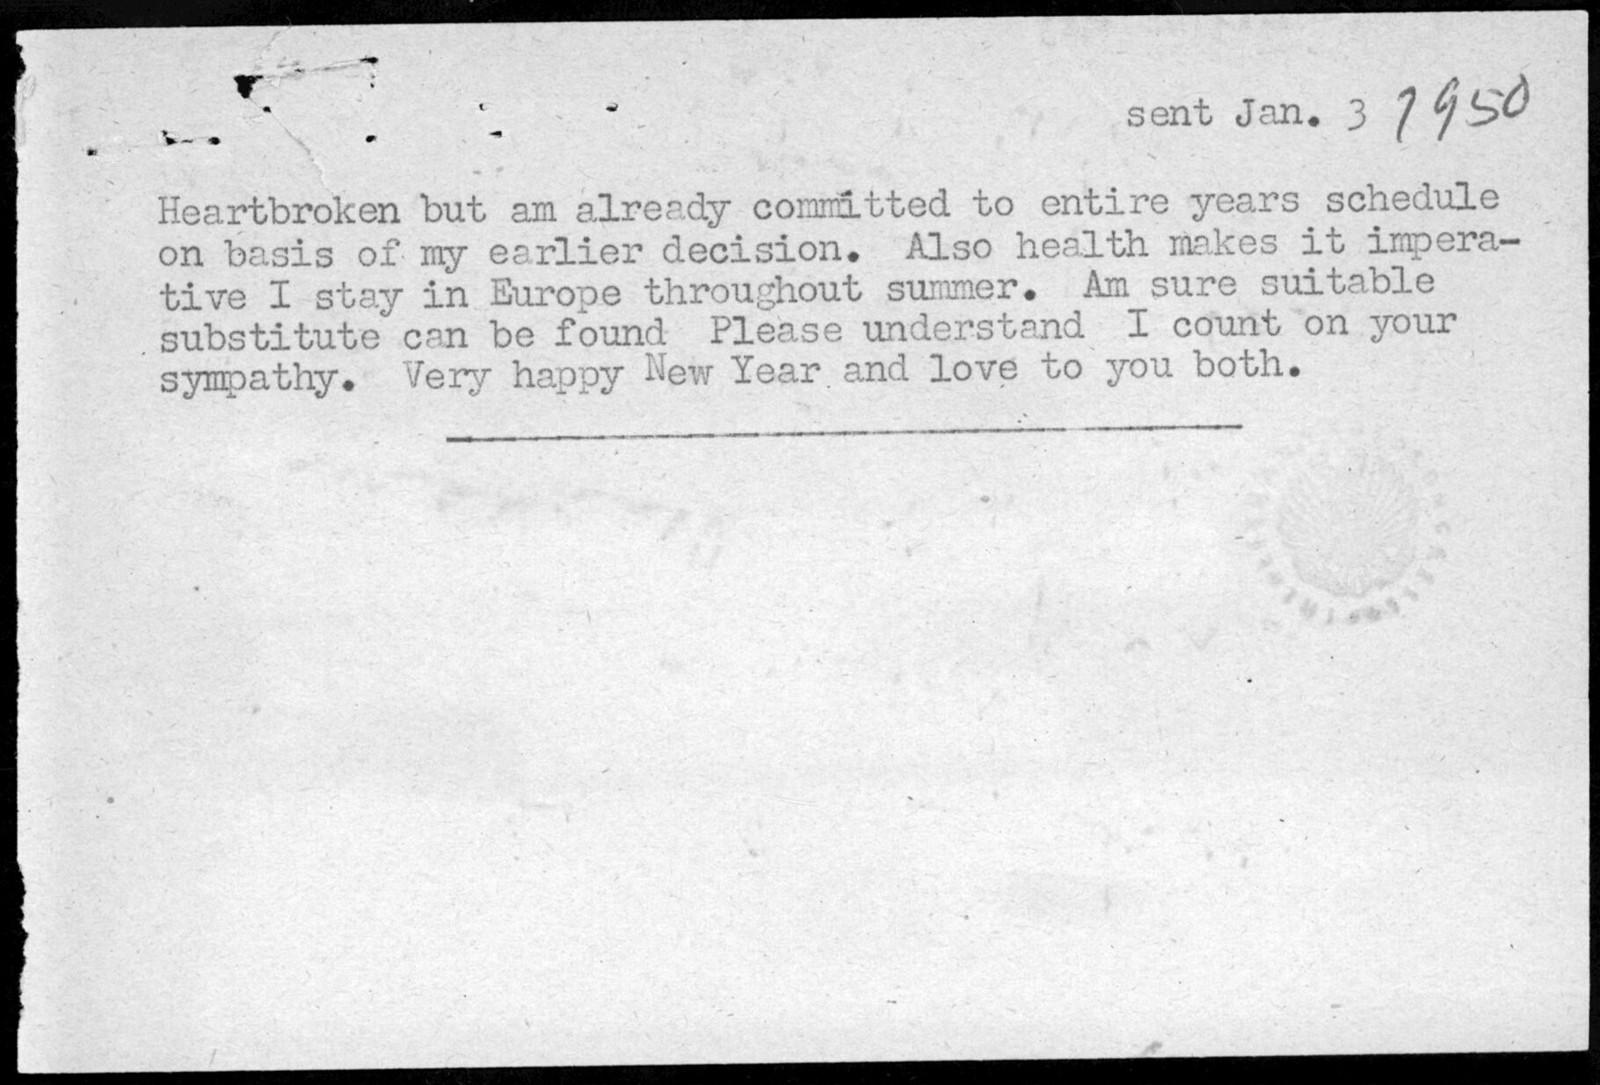 Letter from Leonard Bernstein to Serge Koussevitzky, January 3, 1950